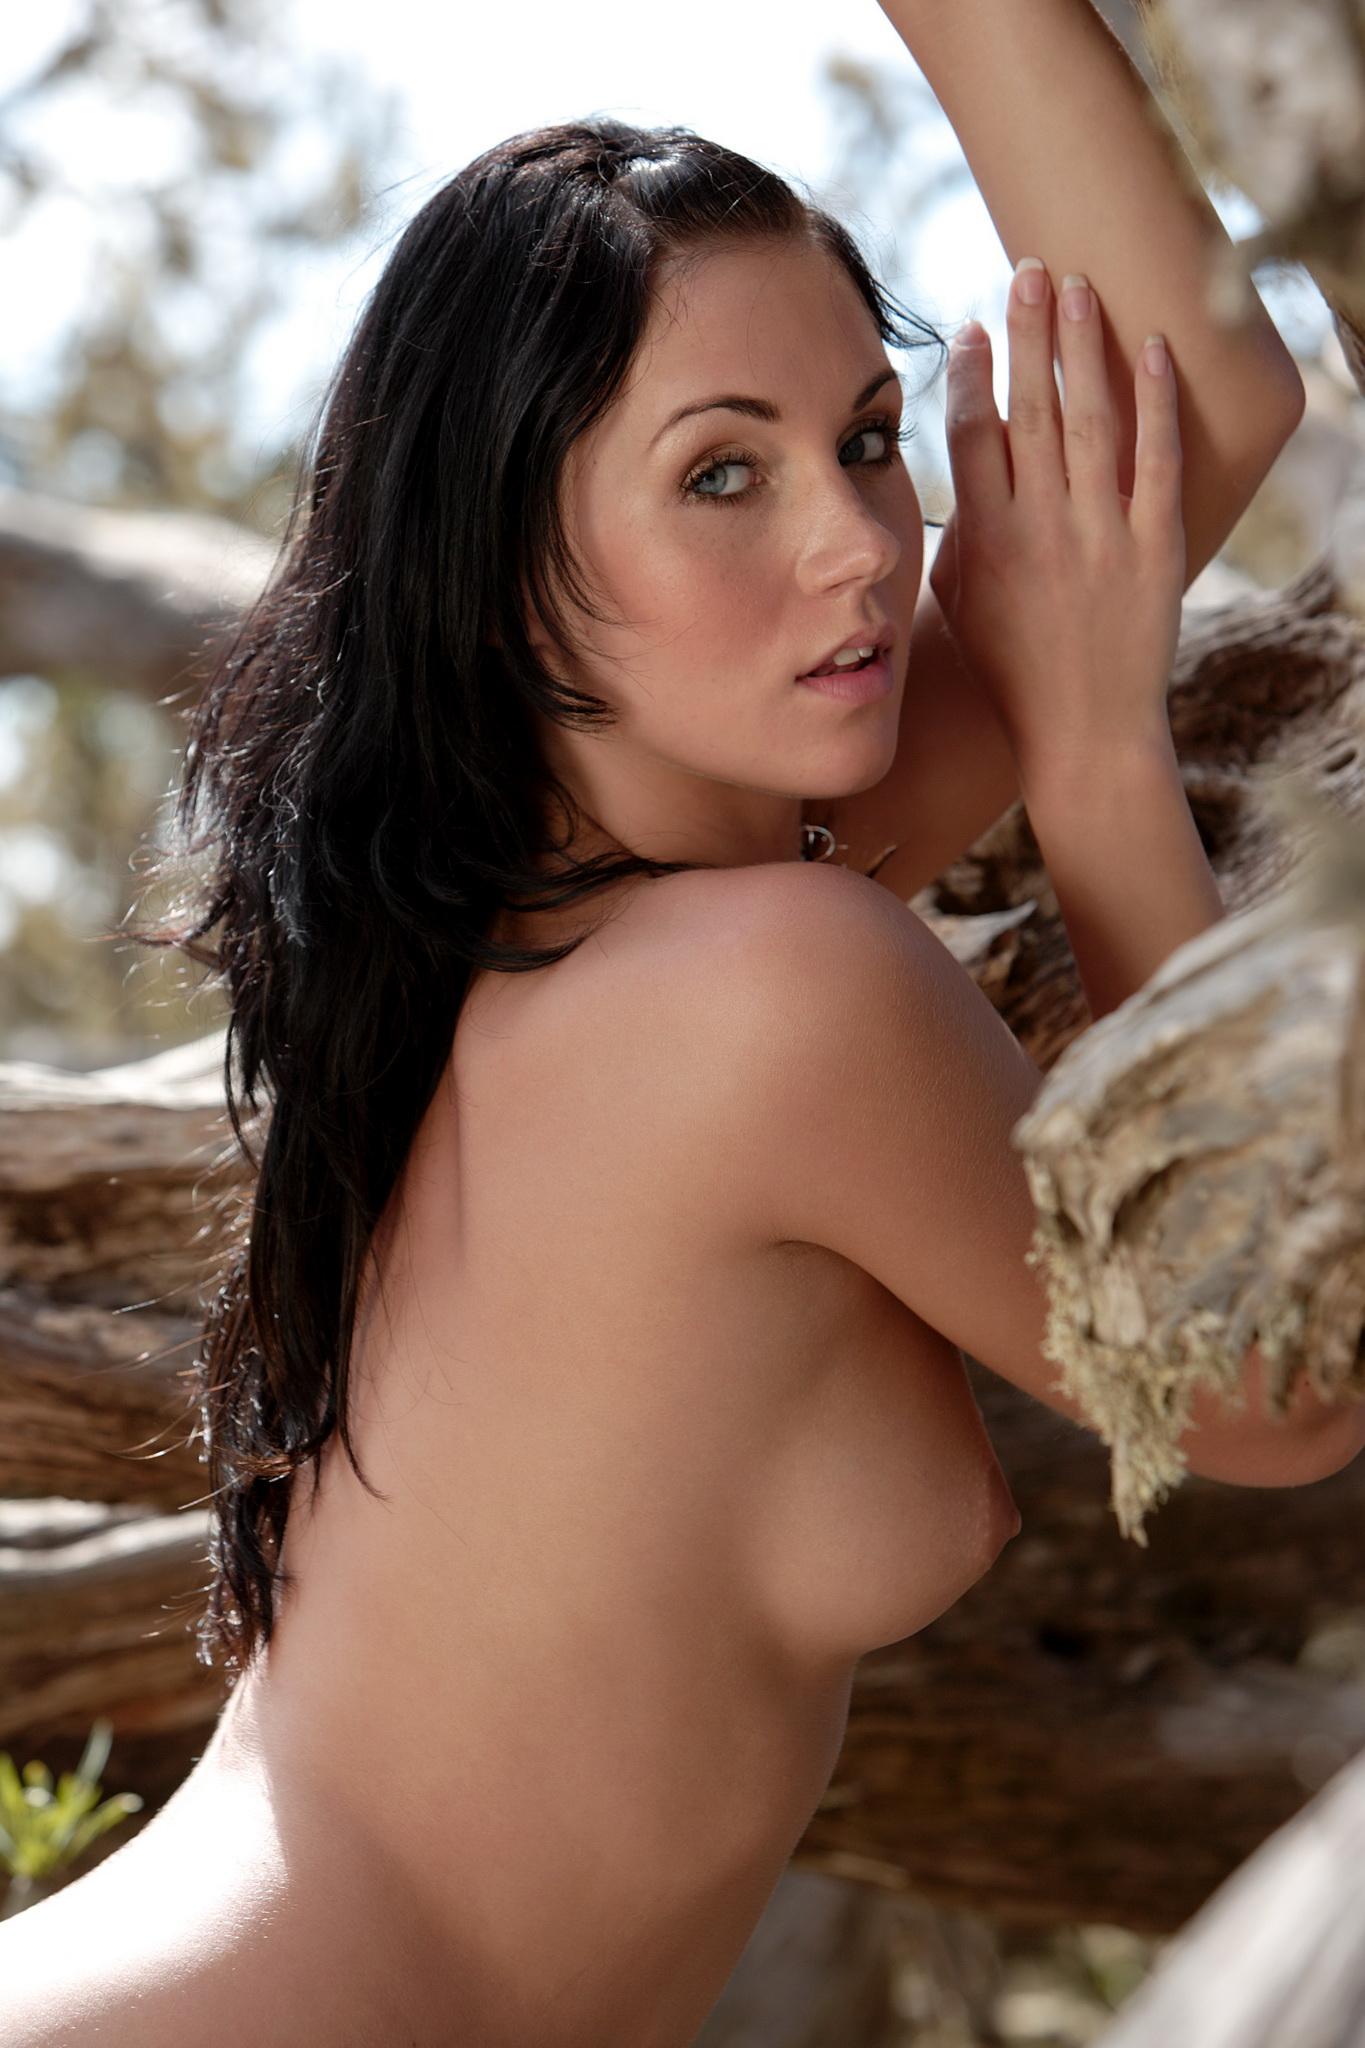 Naked pics of females